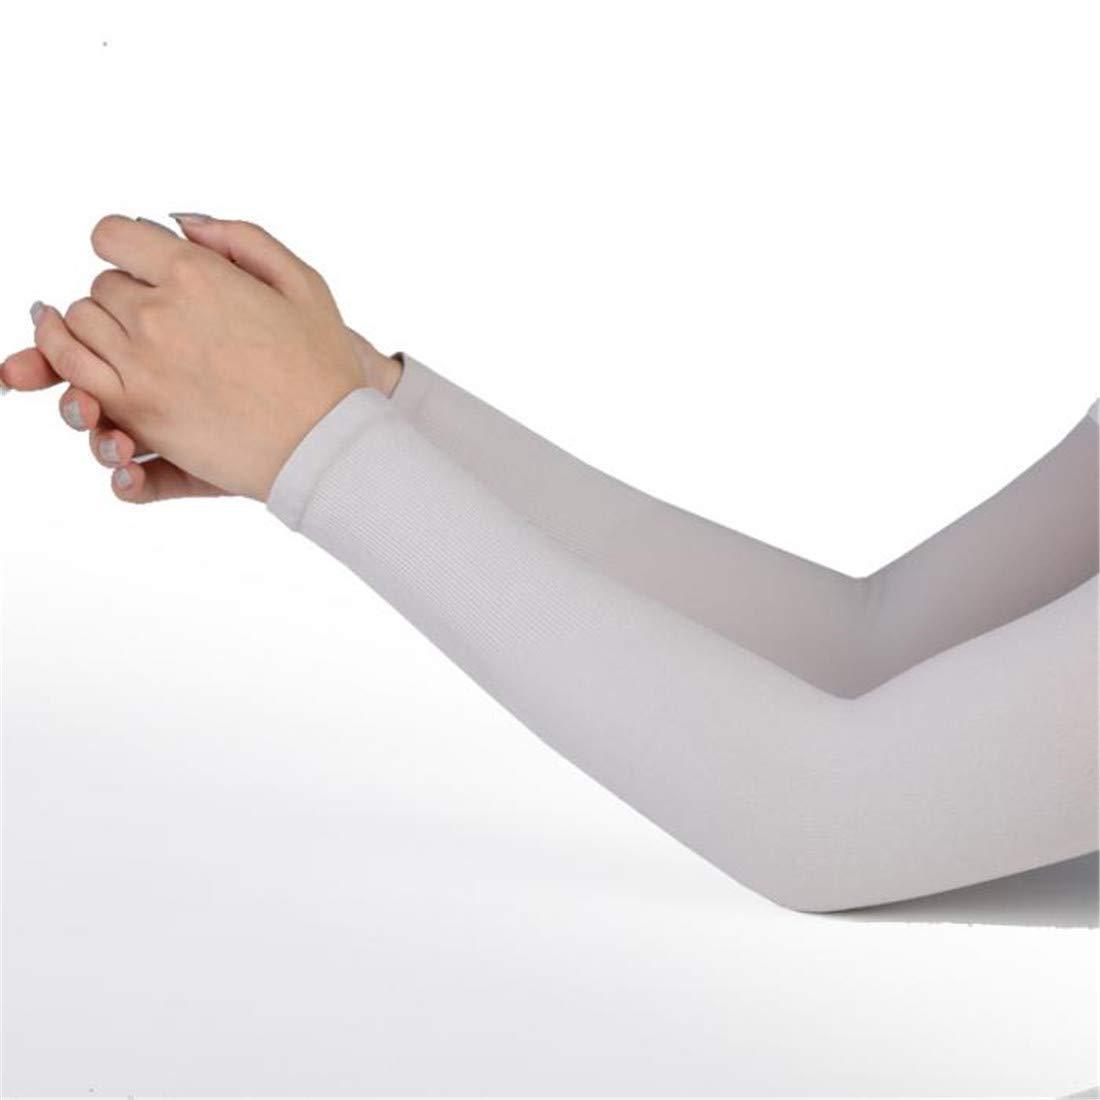 1 Pair Men Women Arm Sleeves Summer Sun UV Protection Arm Cover White